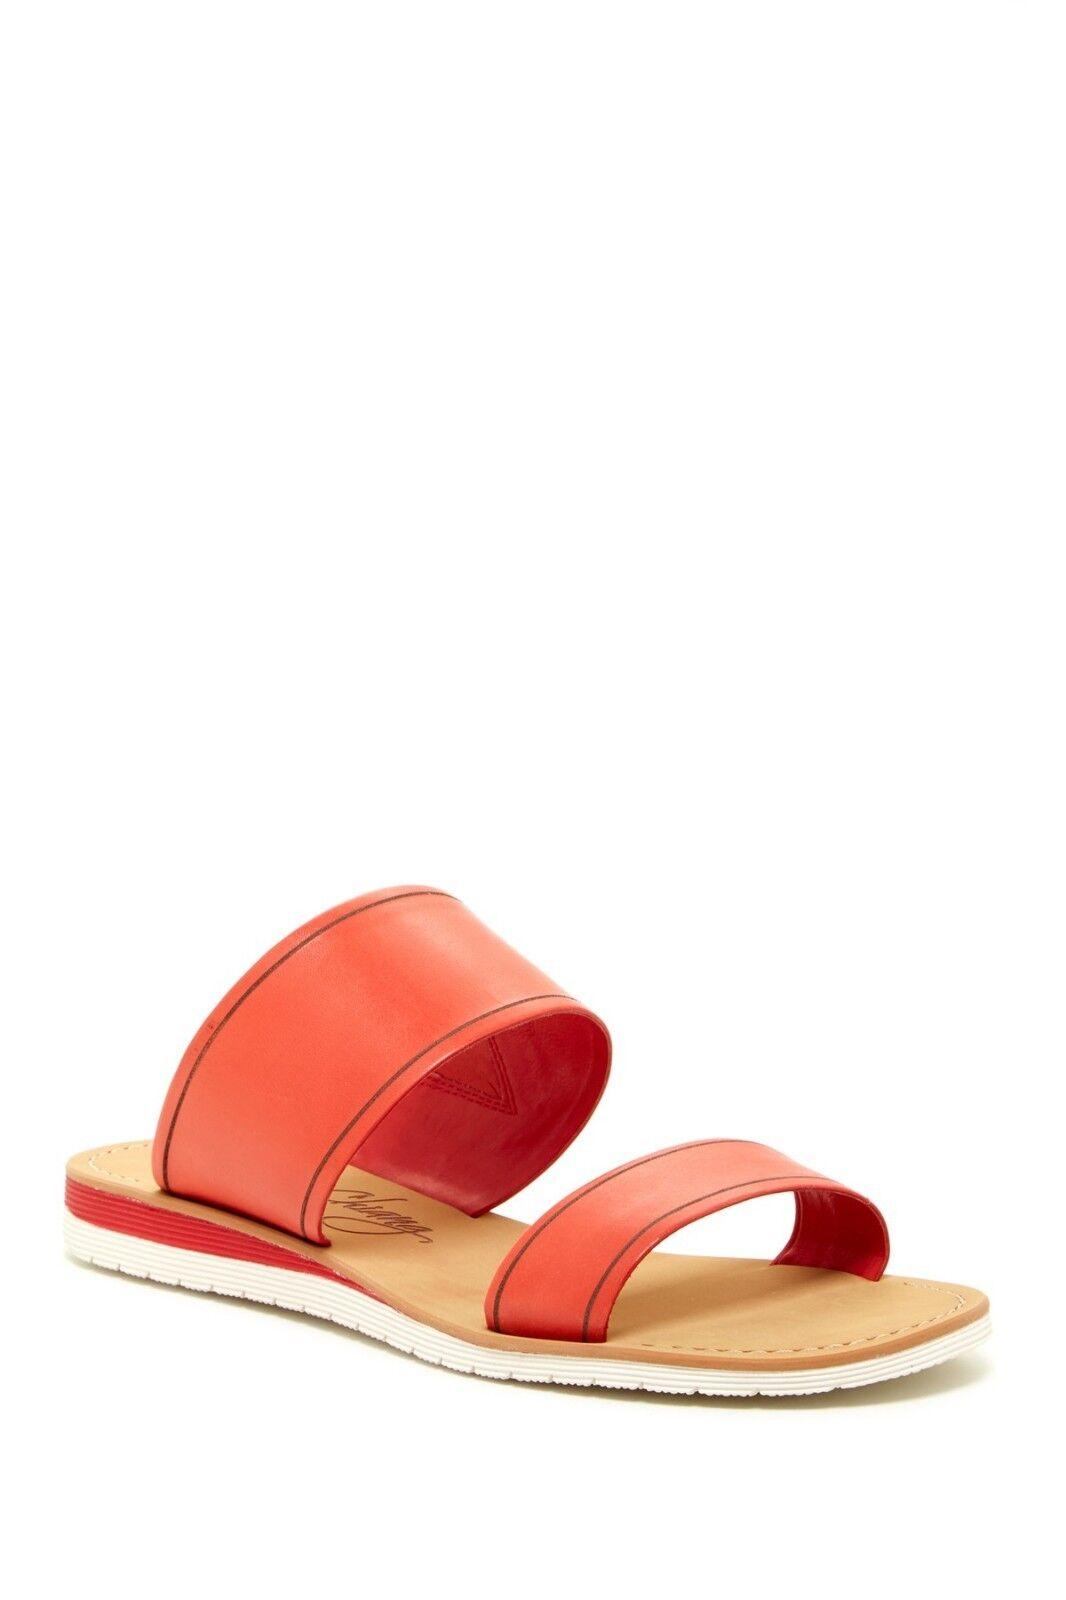 NEW Arturo Chiang Joey Slide Sandal, RED FLAME  VACHETTA, Women Size 9.5  FLAME $69 5d67de